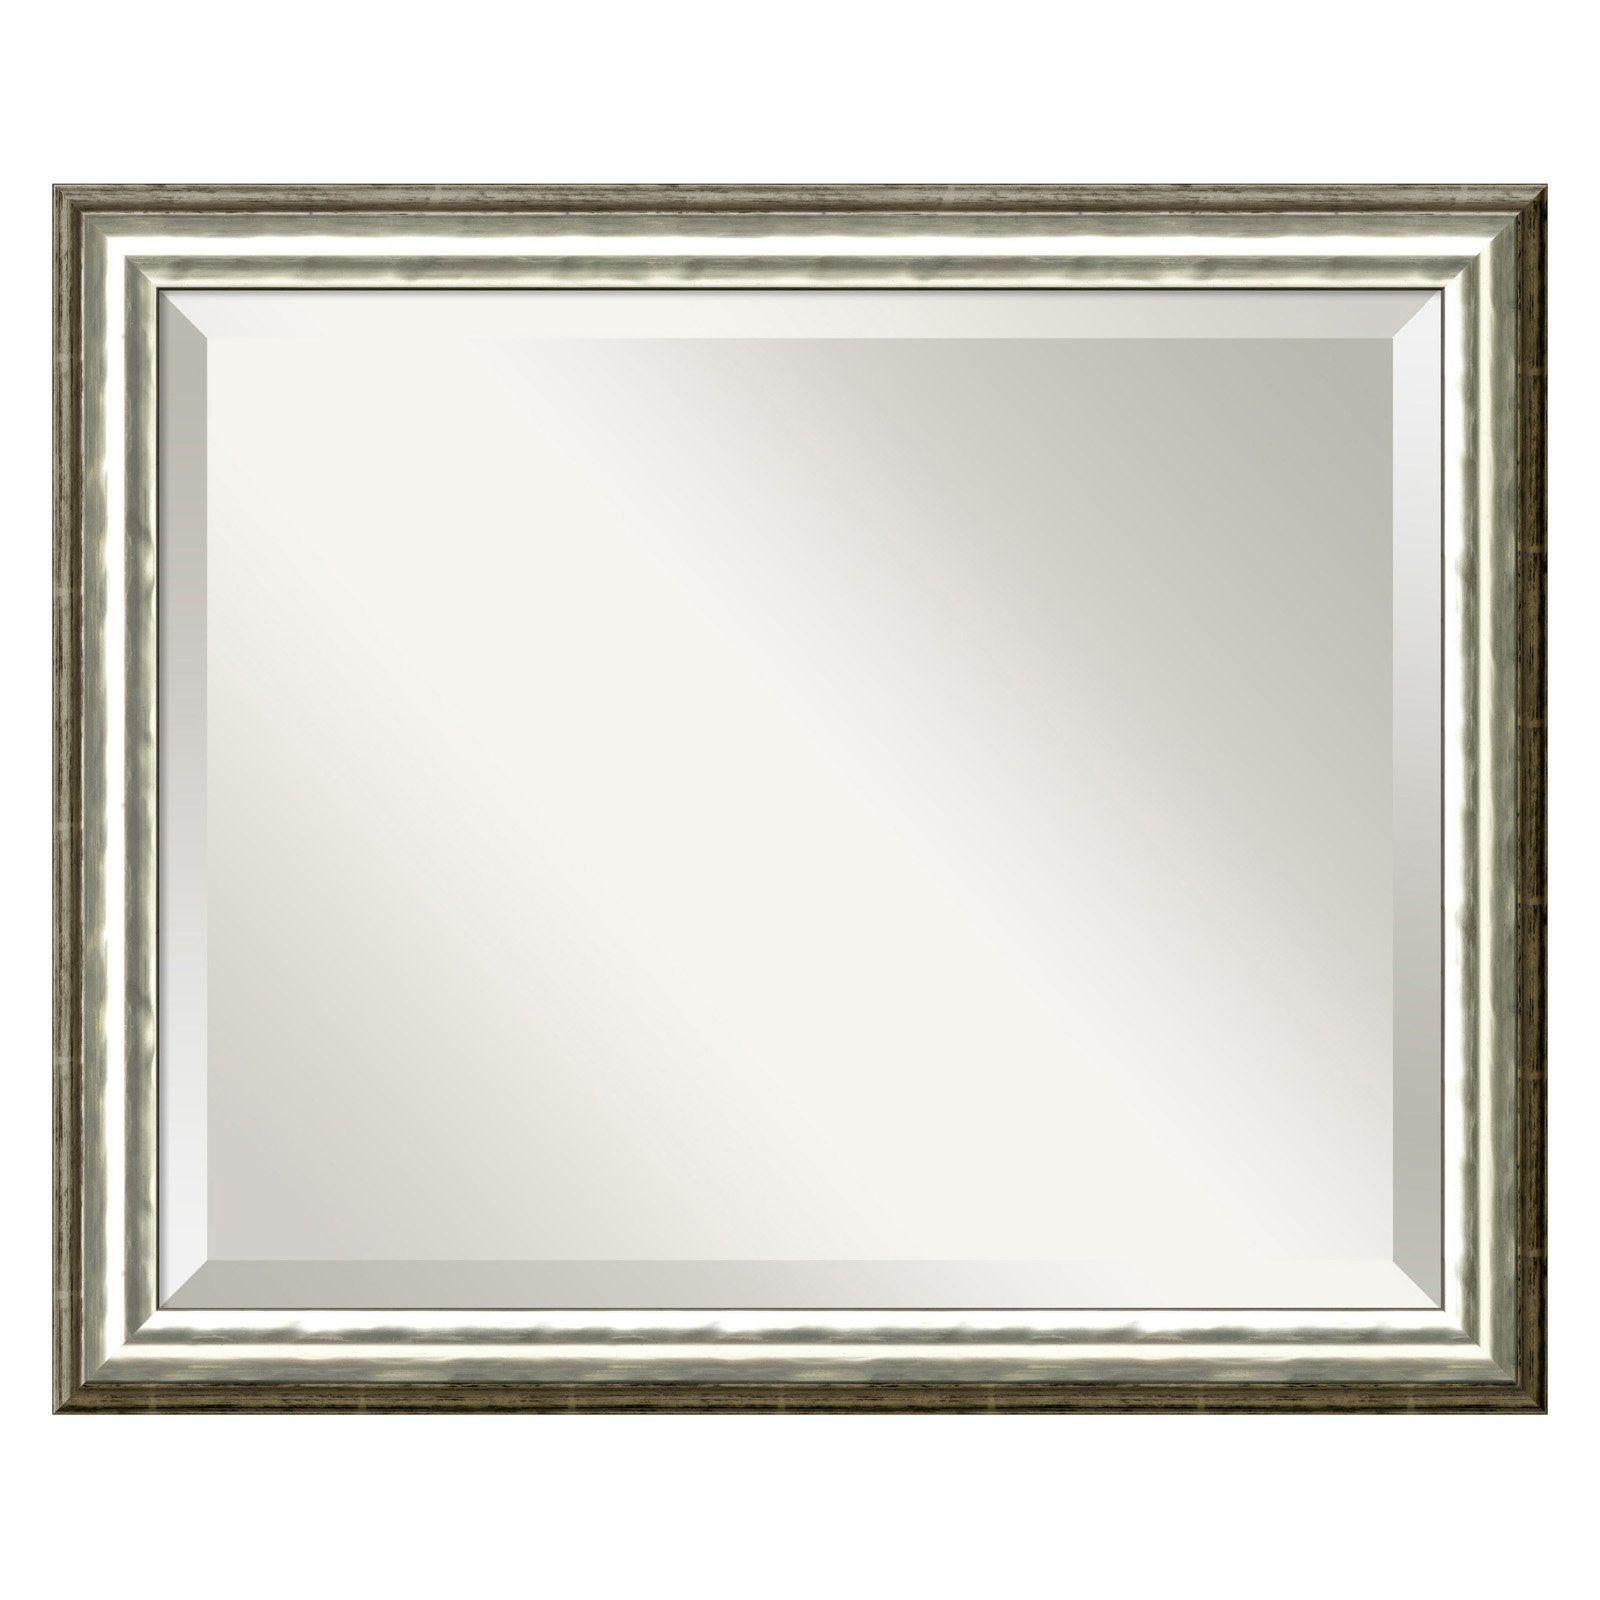 Wonderful ideas vanity wall mirror with lights wall mirror